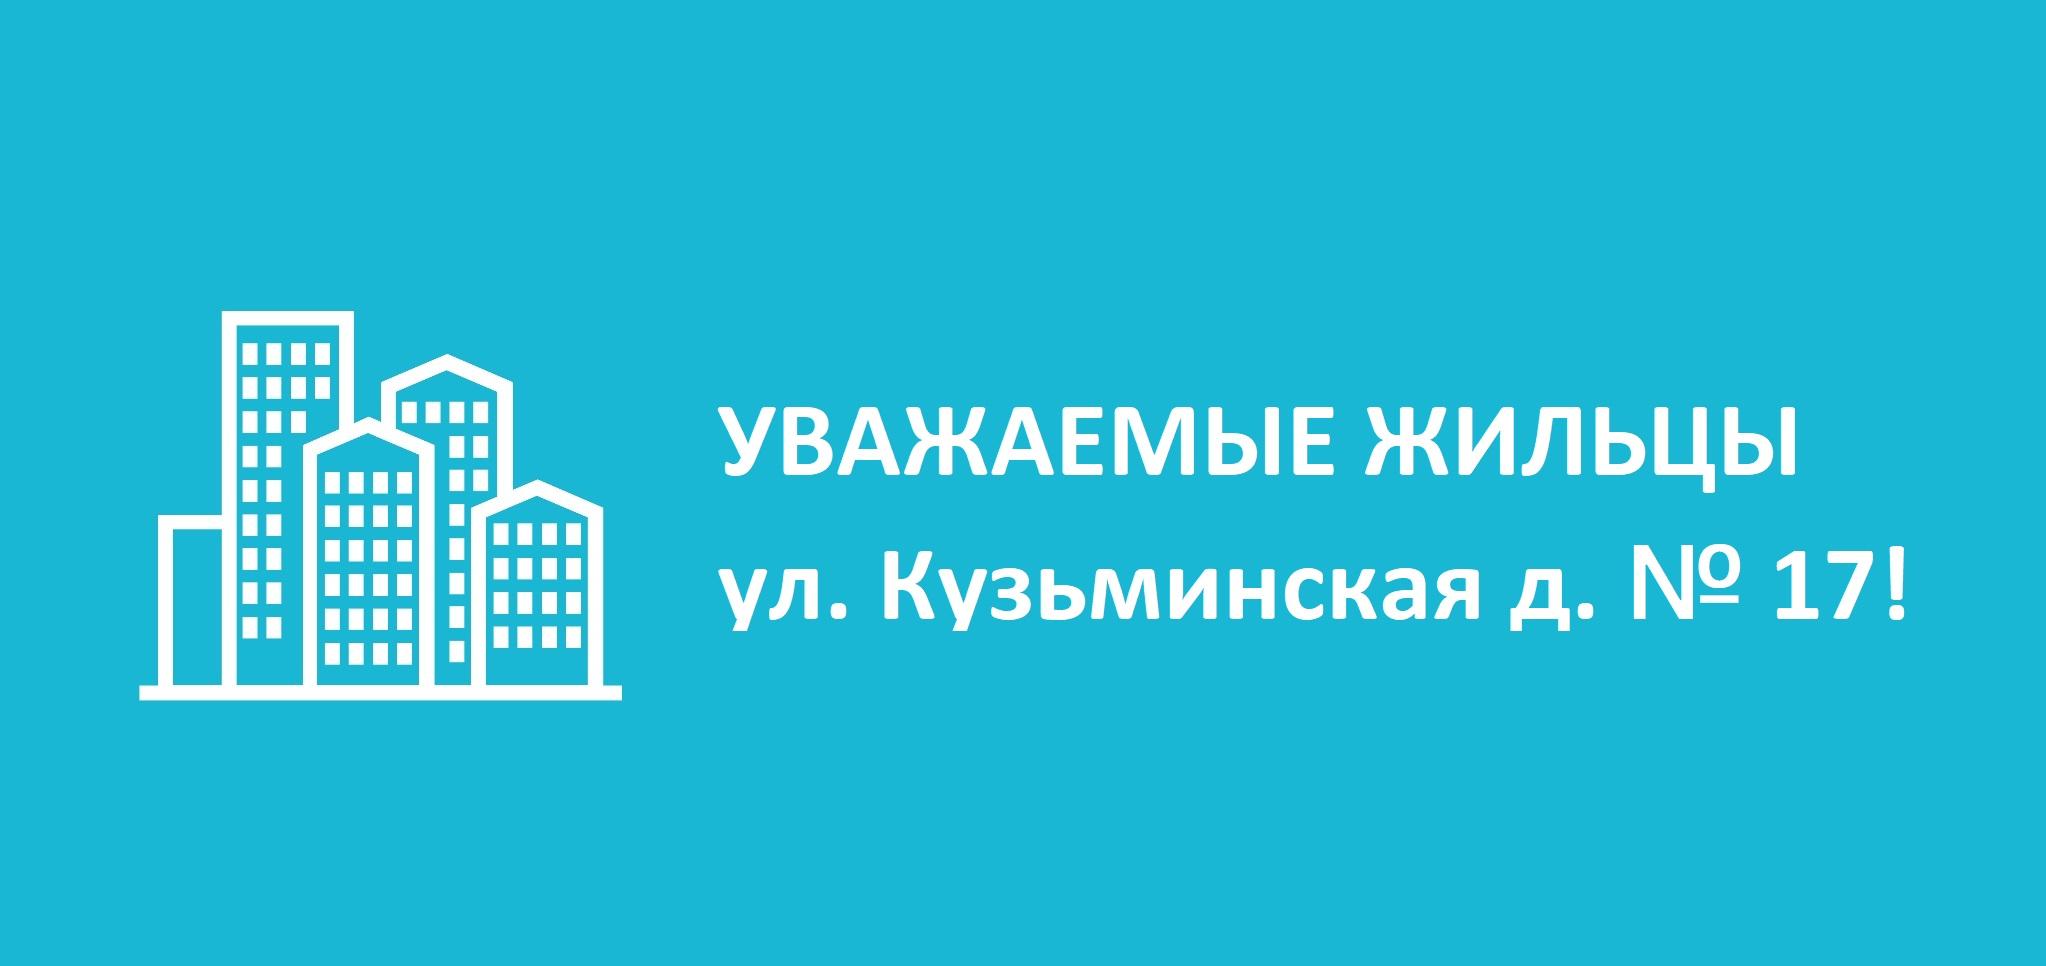 УВАЖАЕМЫЕ ЖИЛЬЦЫ ул. Кузьминская д. № 17!